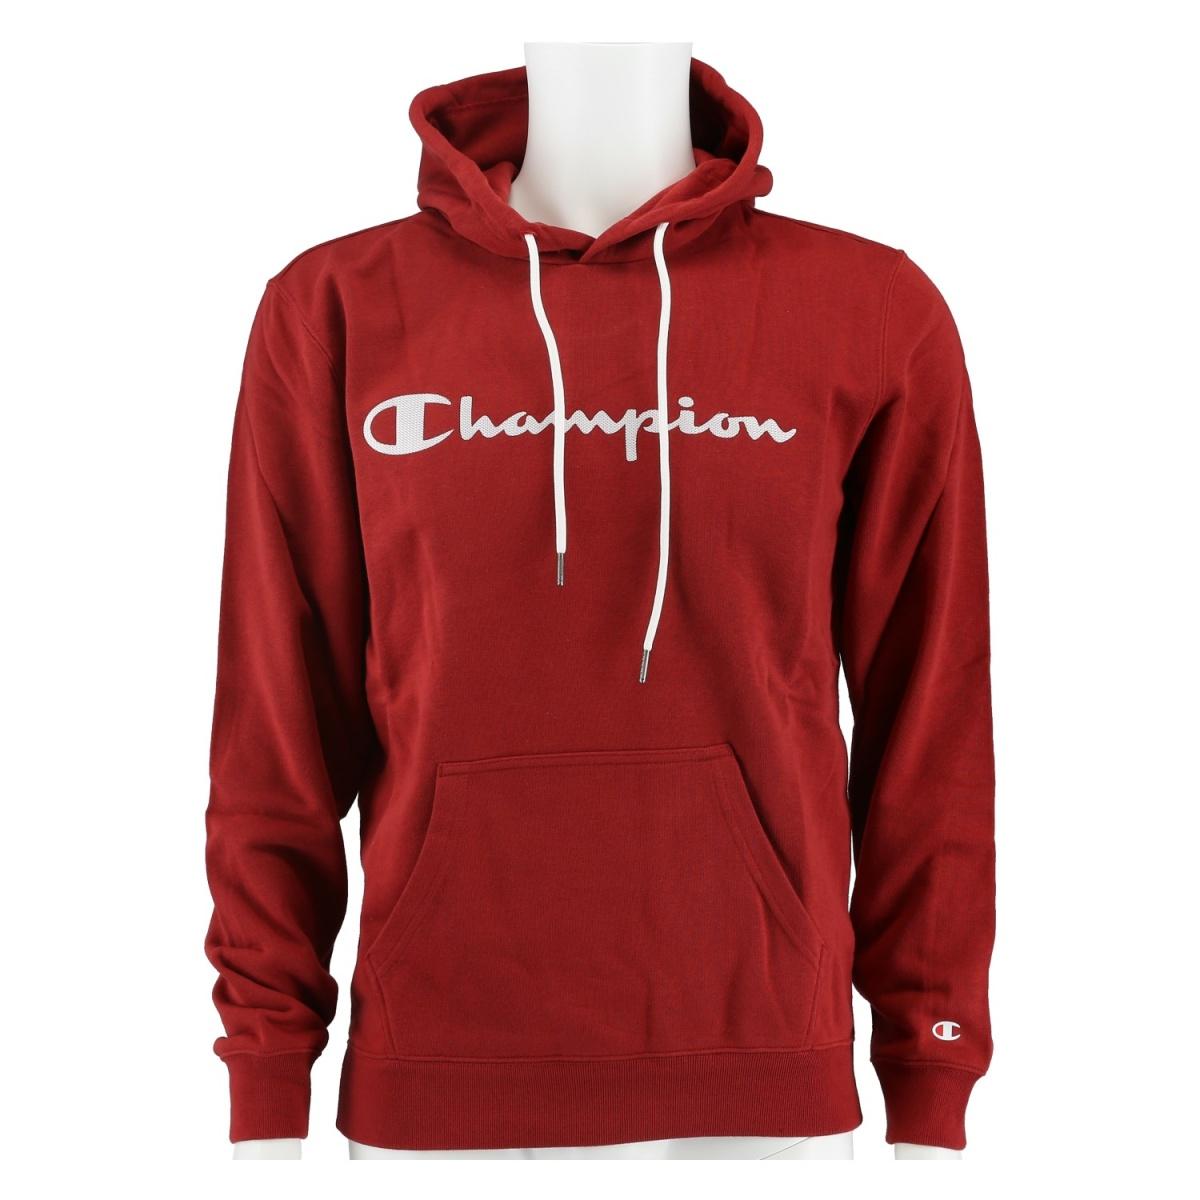 Champion Hoodie Big Logo Print 2020 braun Herren